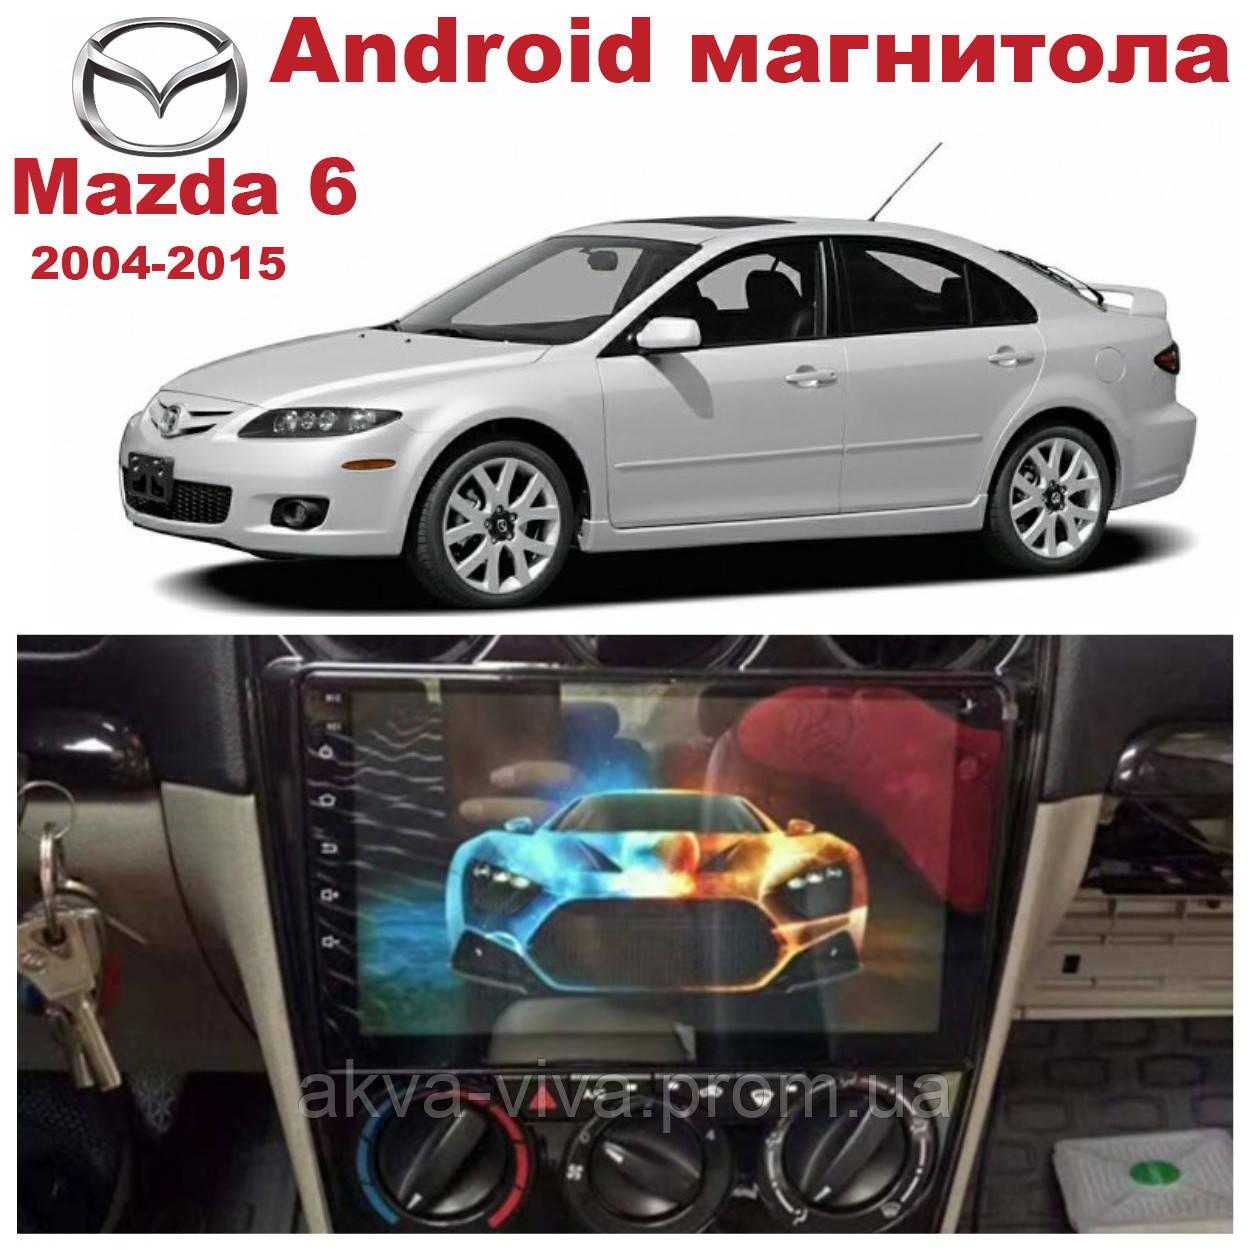 Штатна автомагнітола для Mazda 6 2004-2015 на ANDROID 8.1